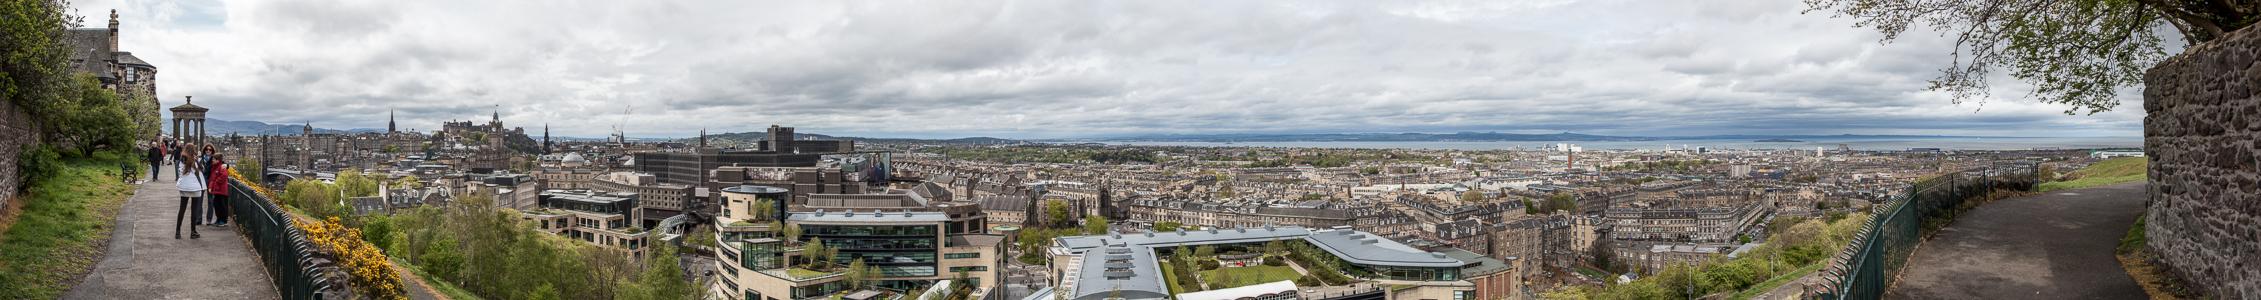 Blick von Calton Hill Edinburgh